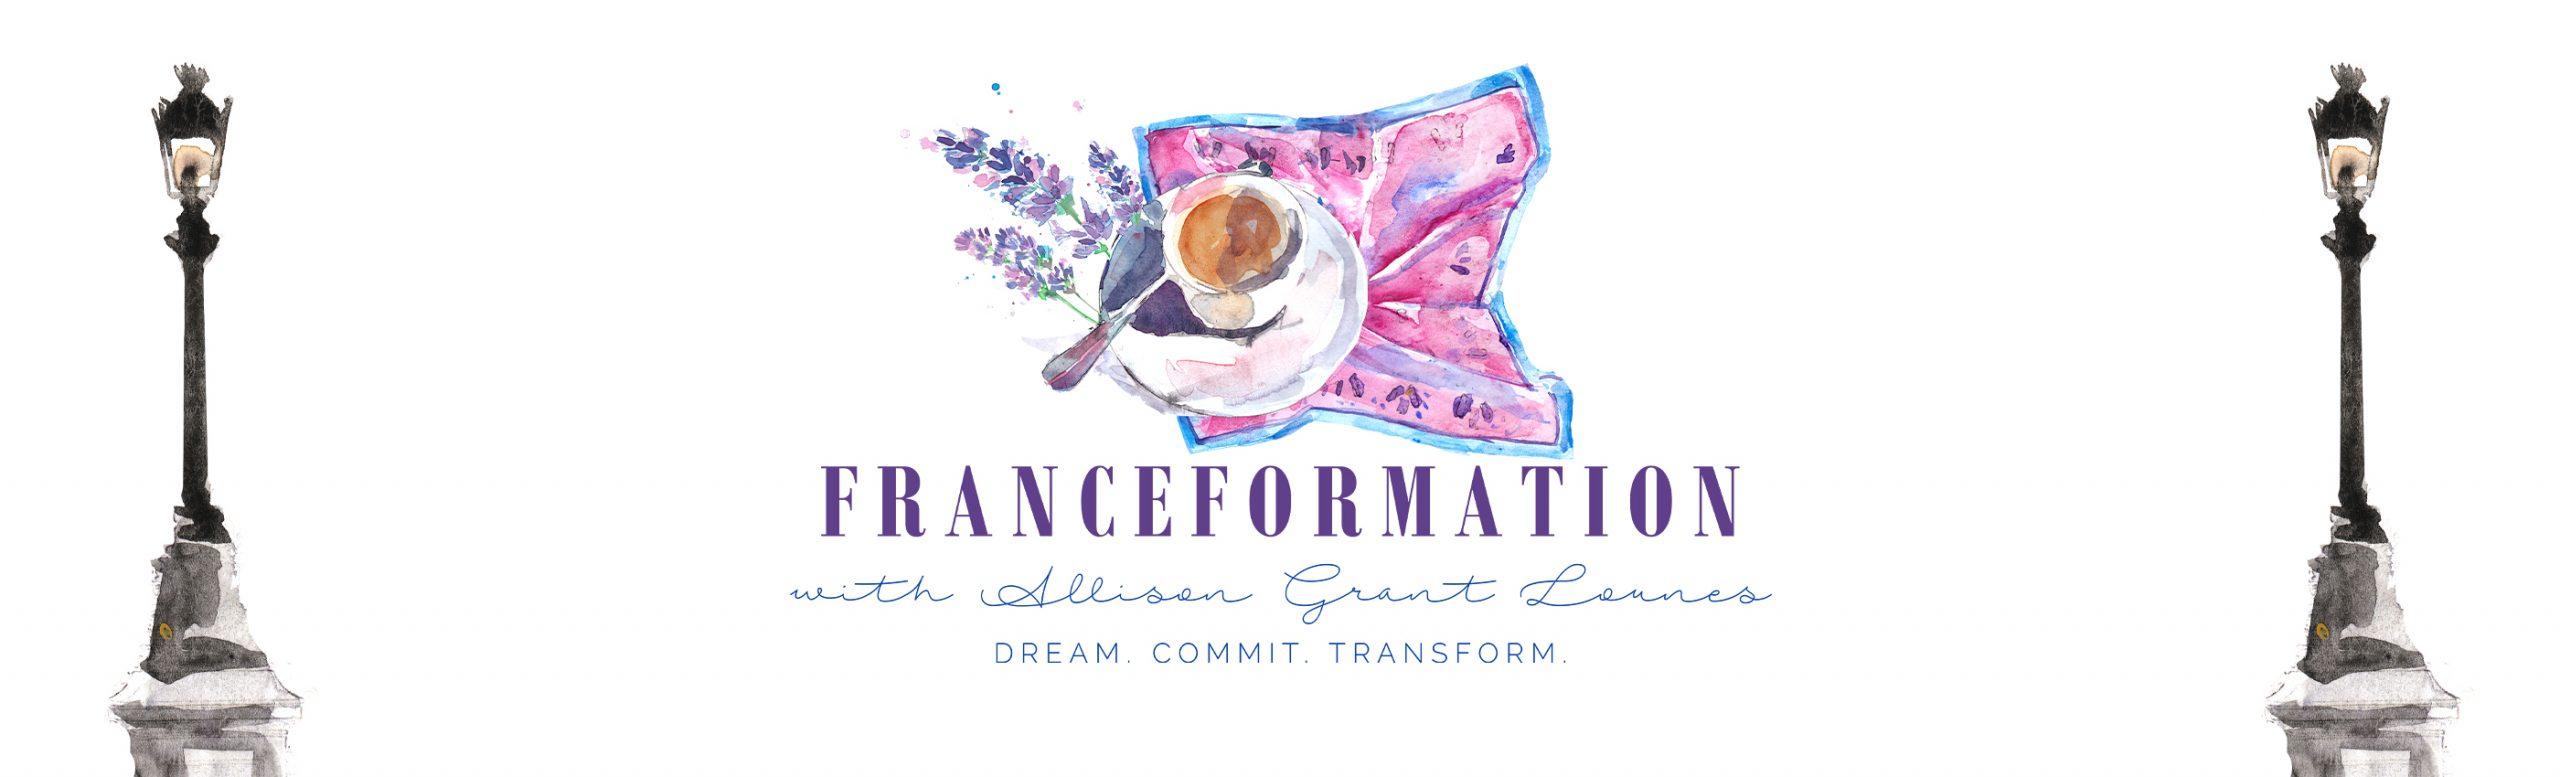 Franceformation : Dream.Commit.Transform